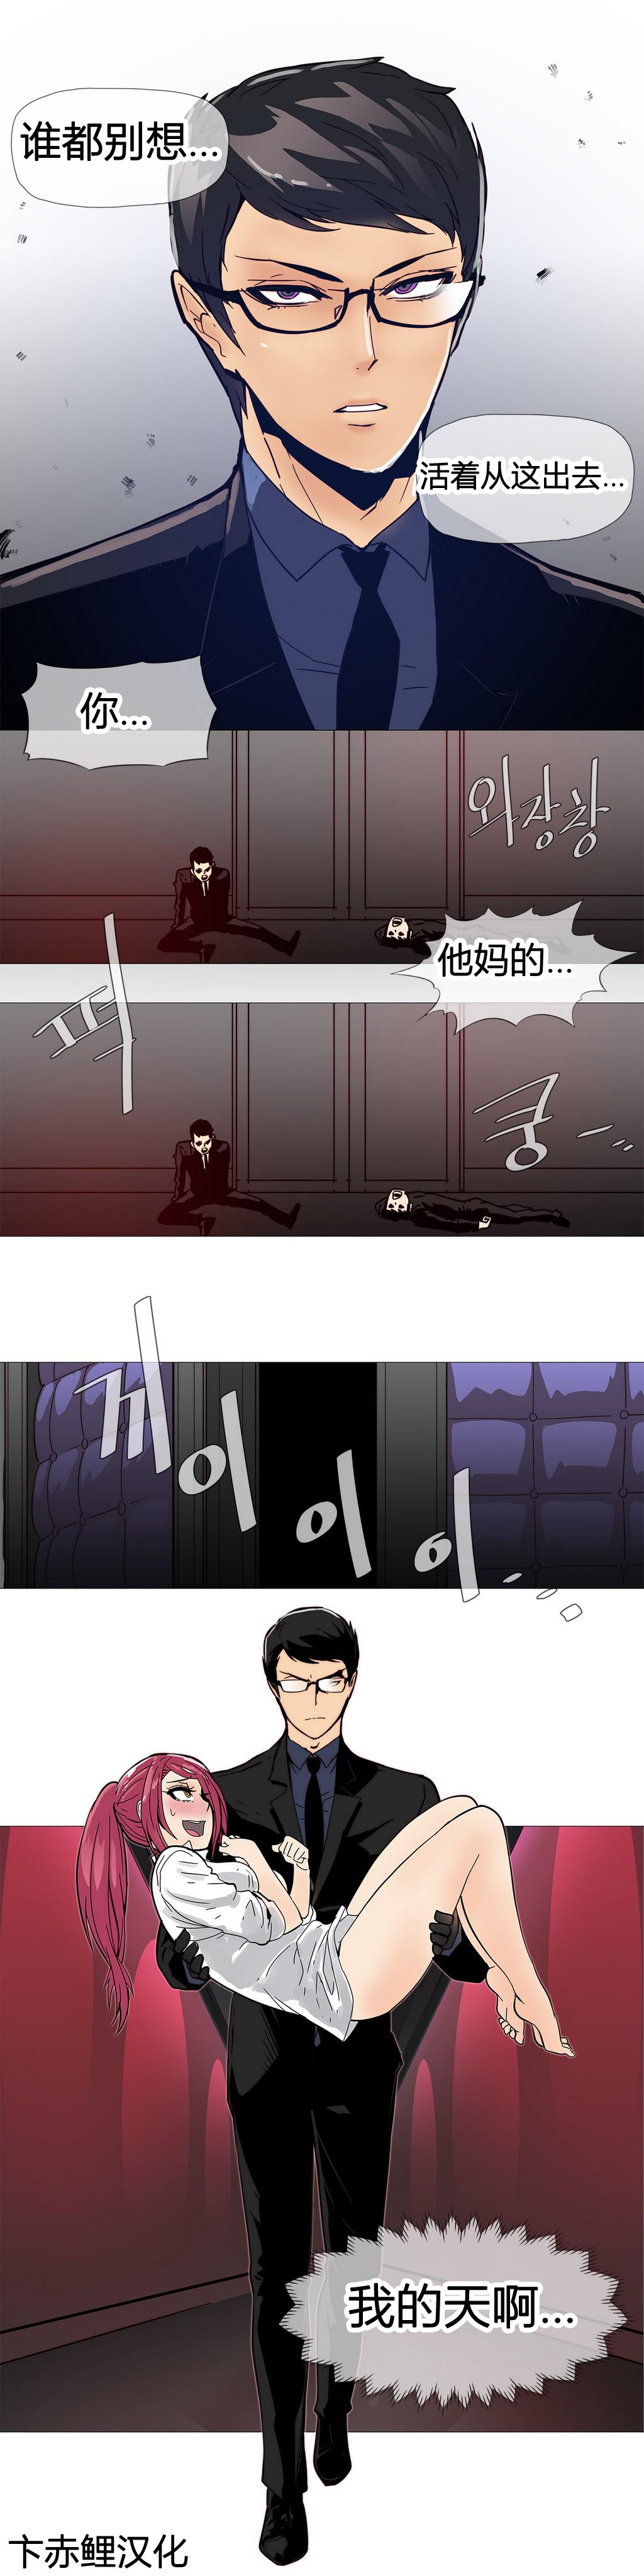 HouseHold Affairs 【卞赤鲤个人汉化】1~21话(持续更新中) 215